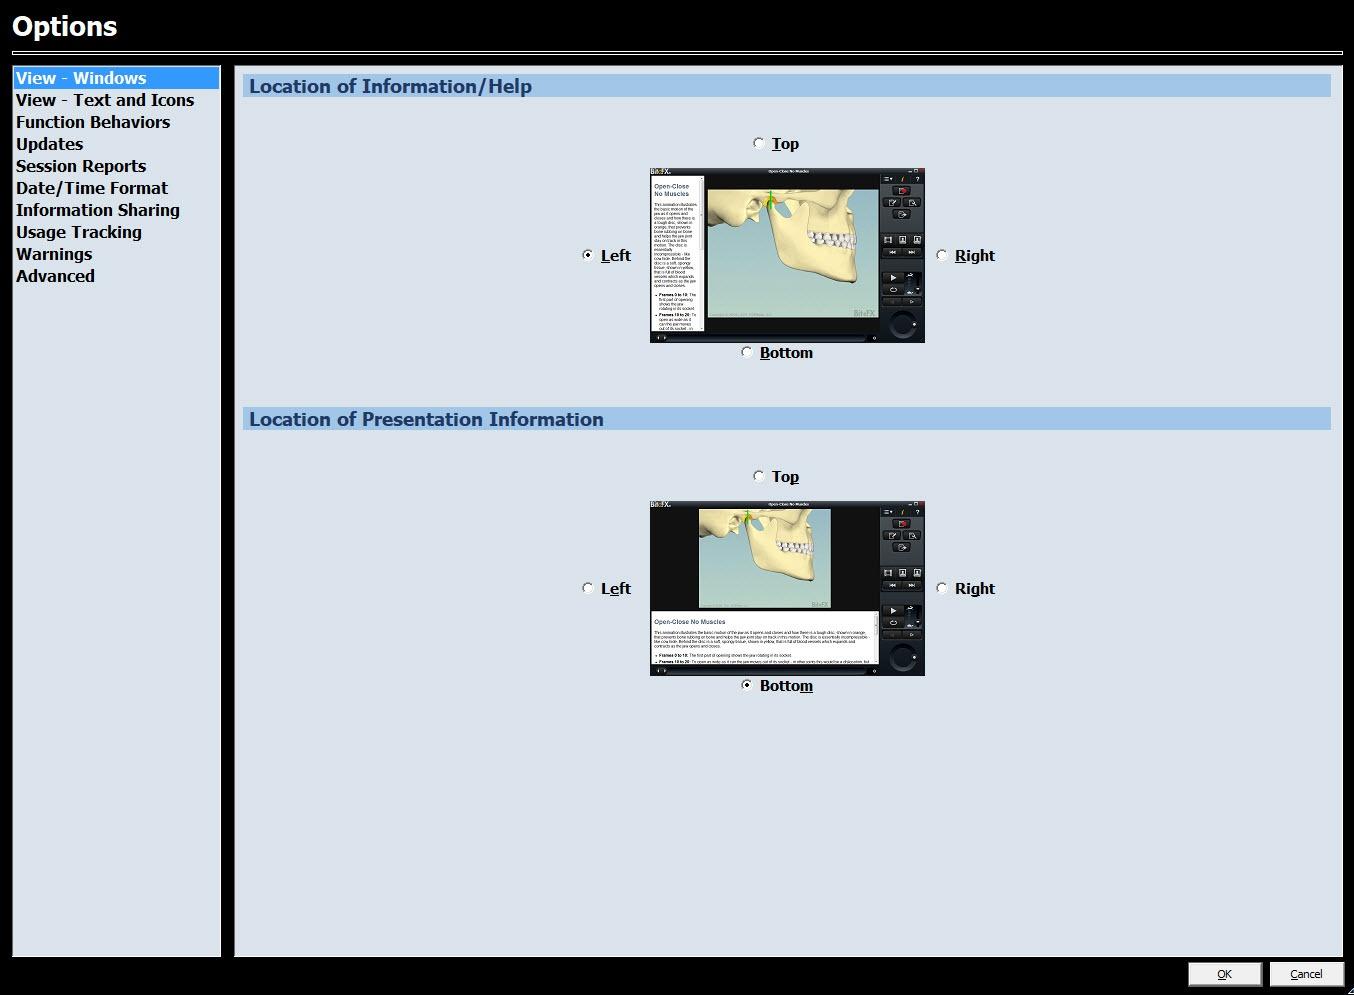 V3 View - Windows #3